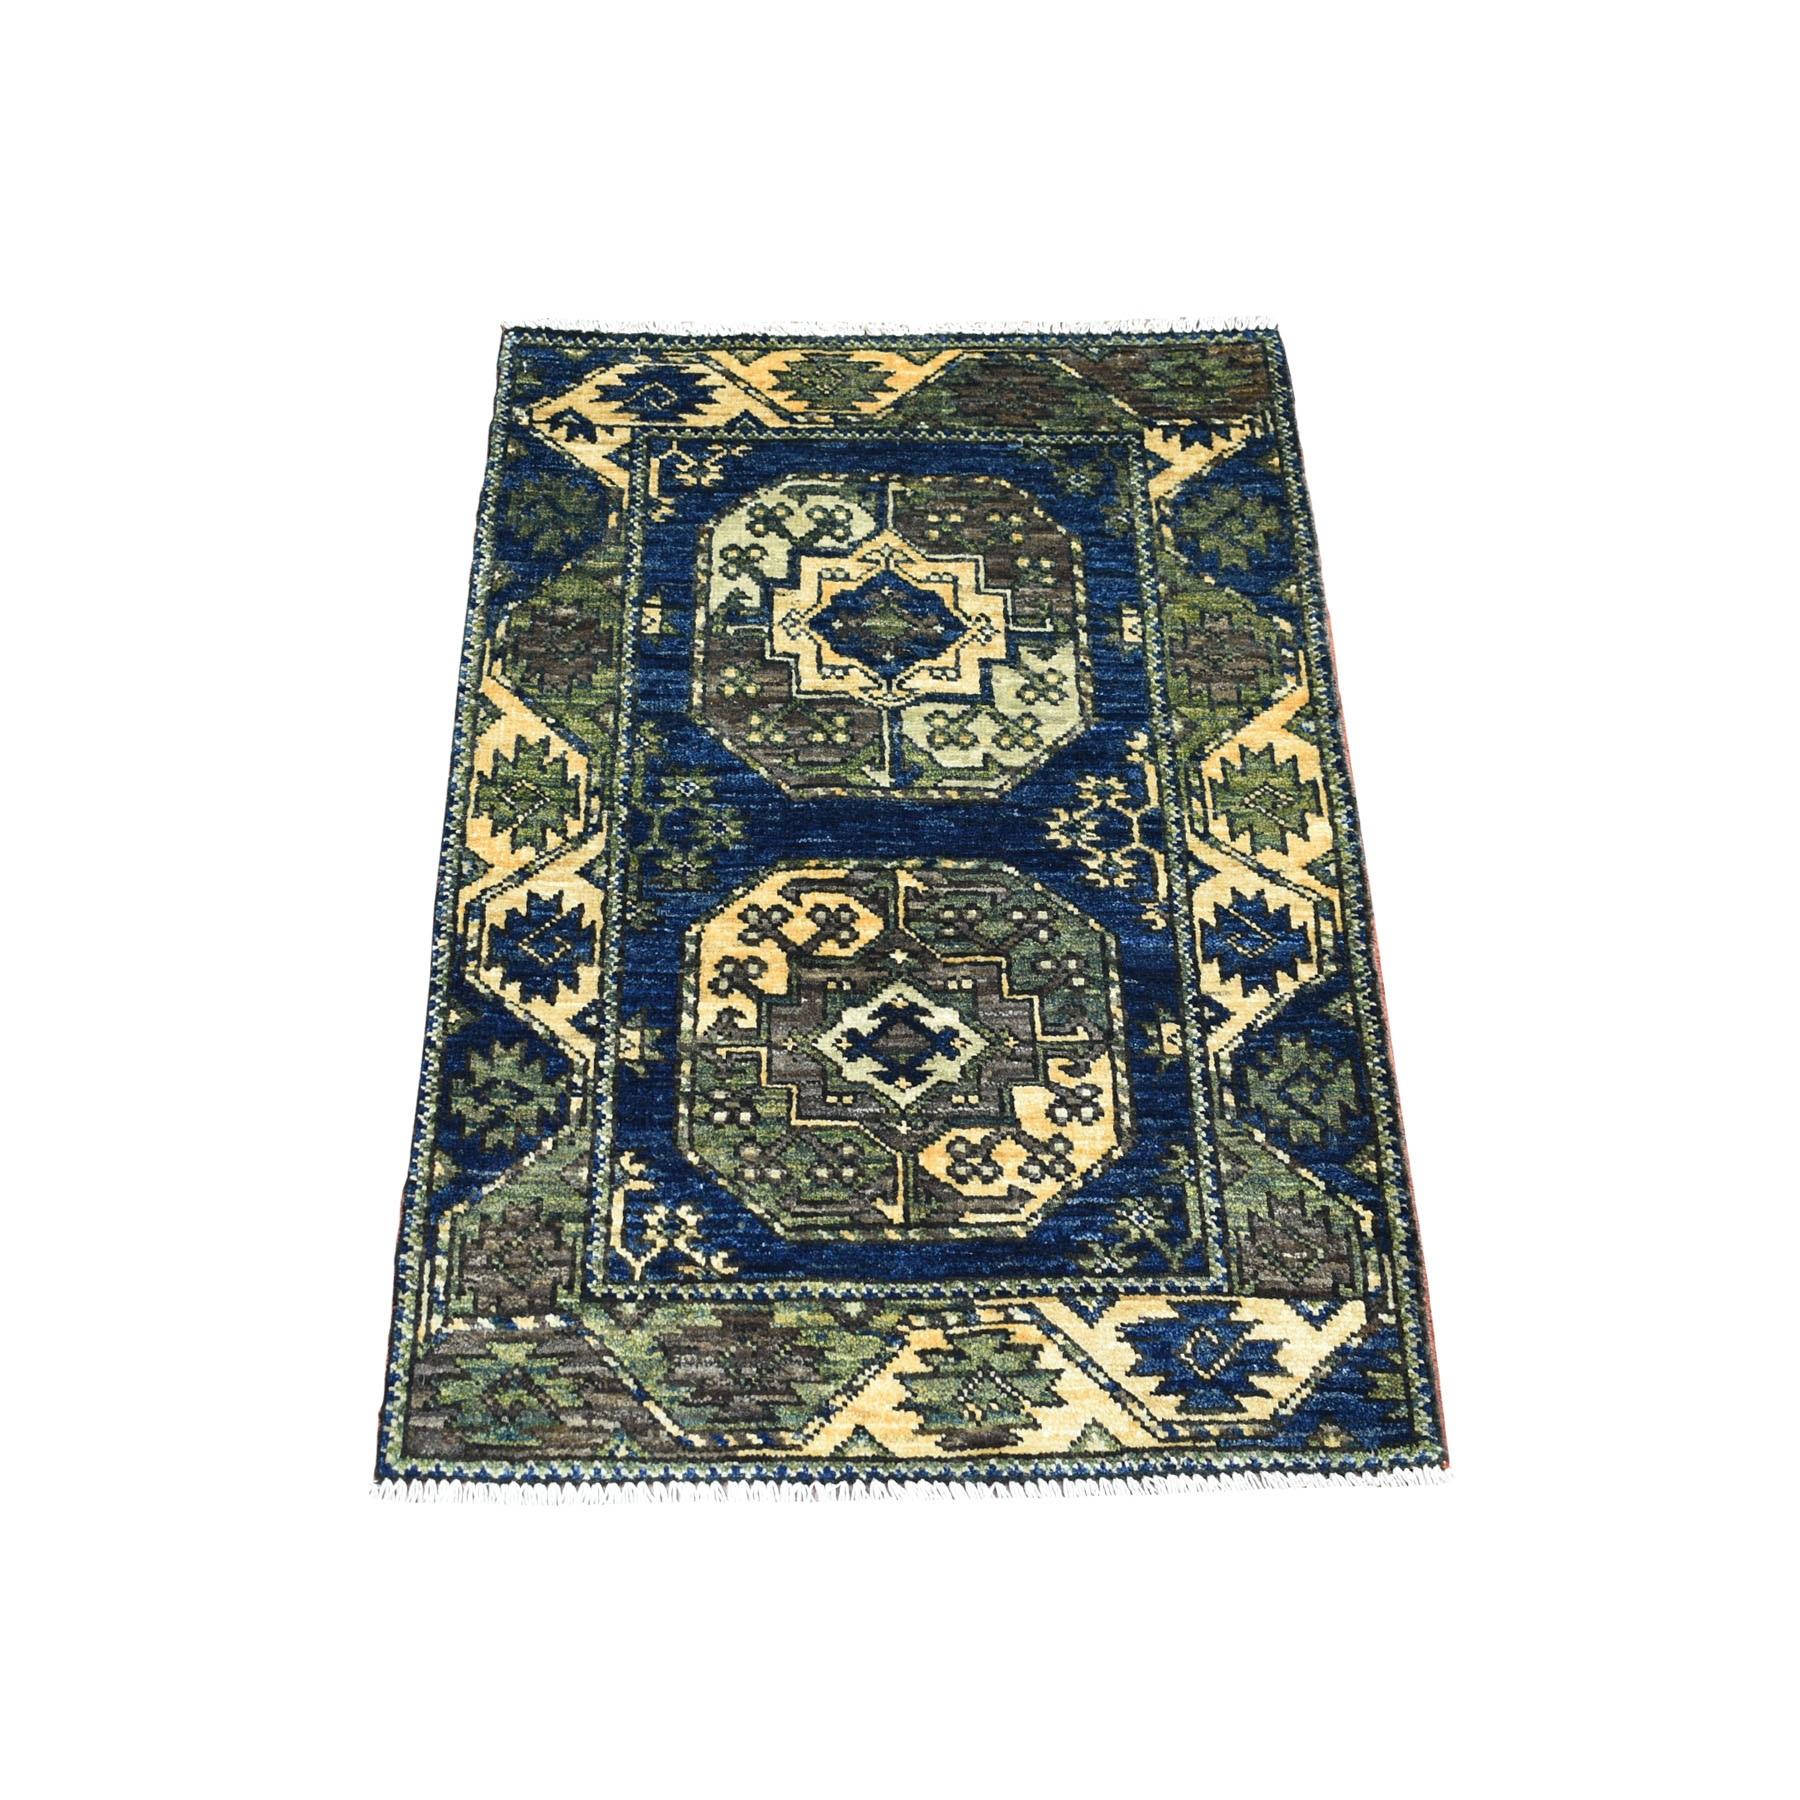 "2'X2'10"" Blue Afghan Ersari Elephant Feet Design Hand Knotted Pure Wool Oriental Rug moaeca06"